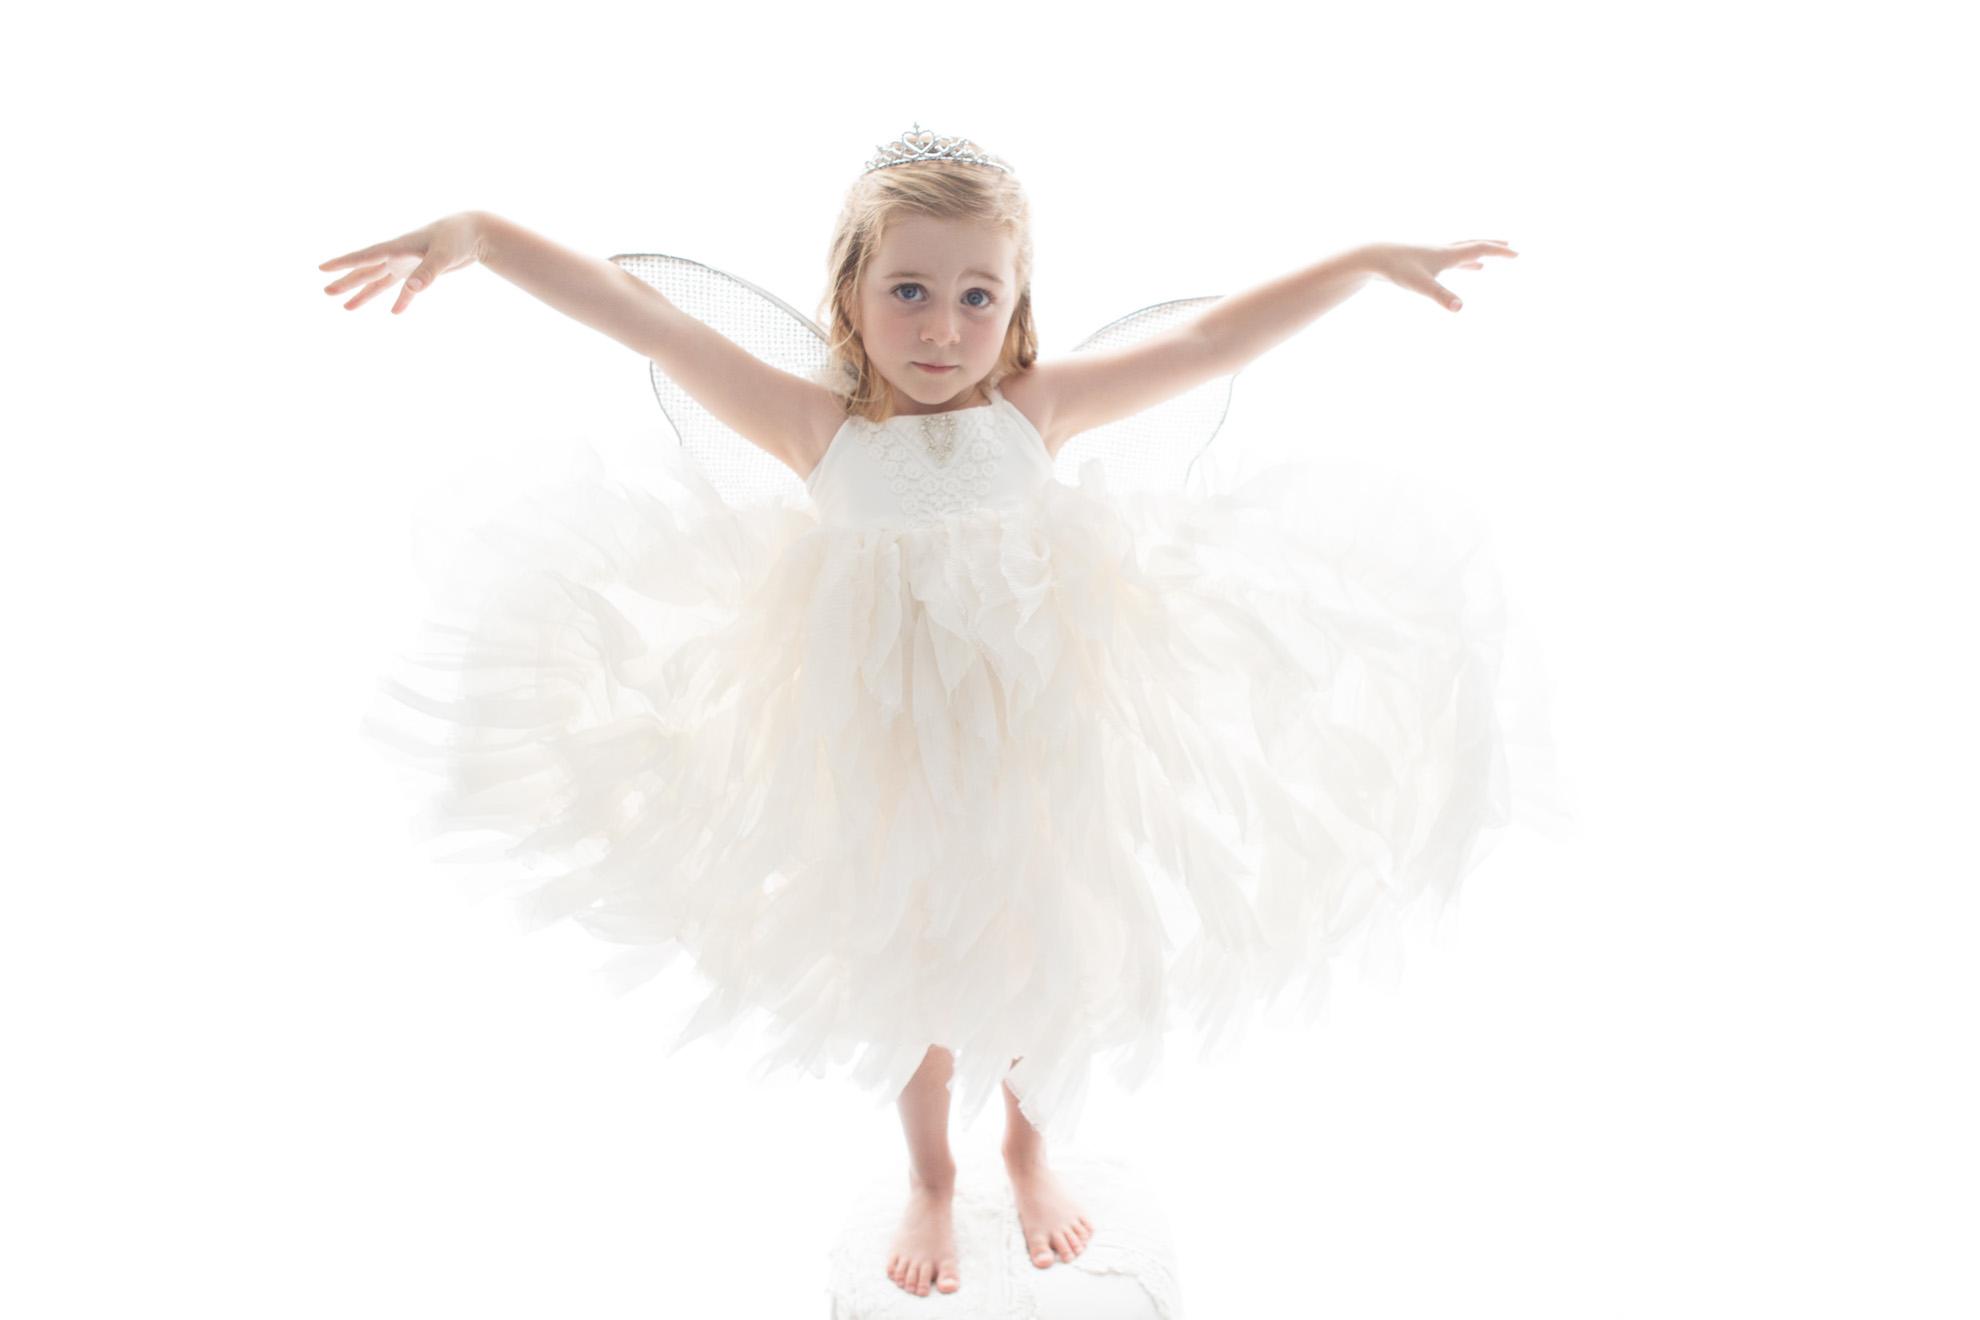 Twirly-whirly-dress.jpg